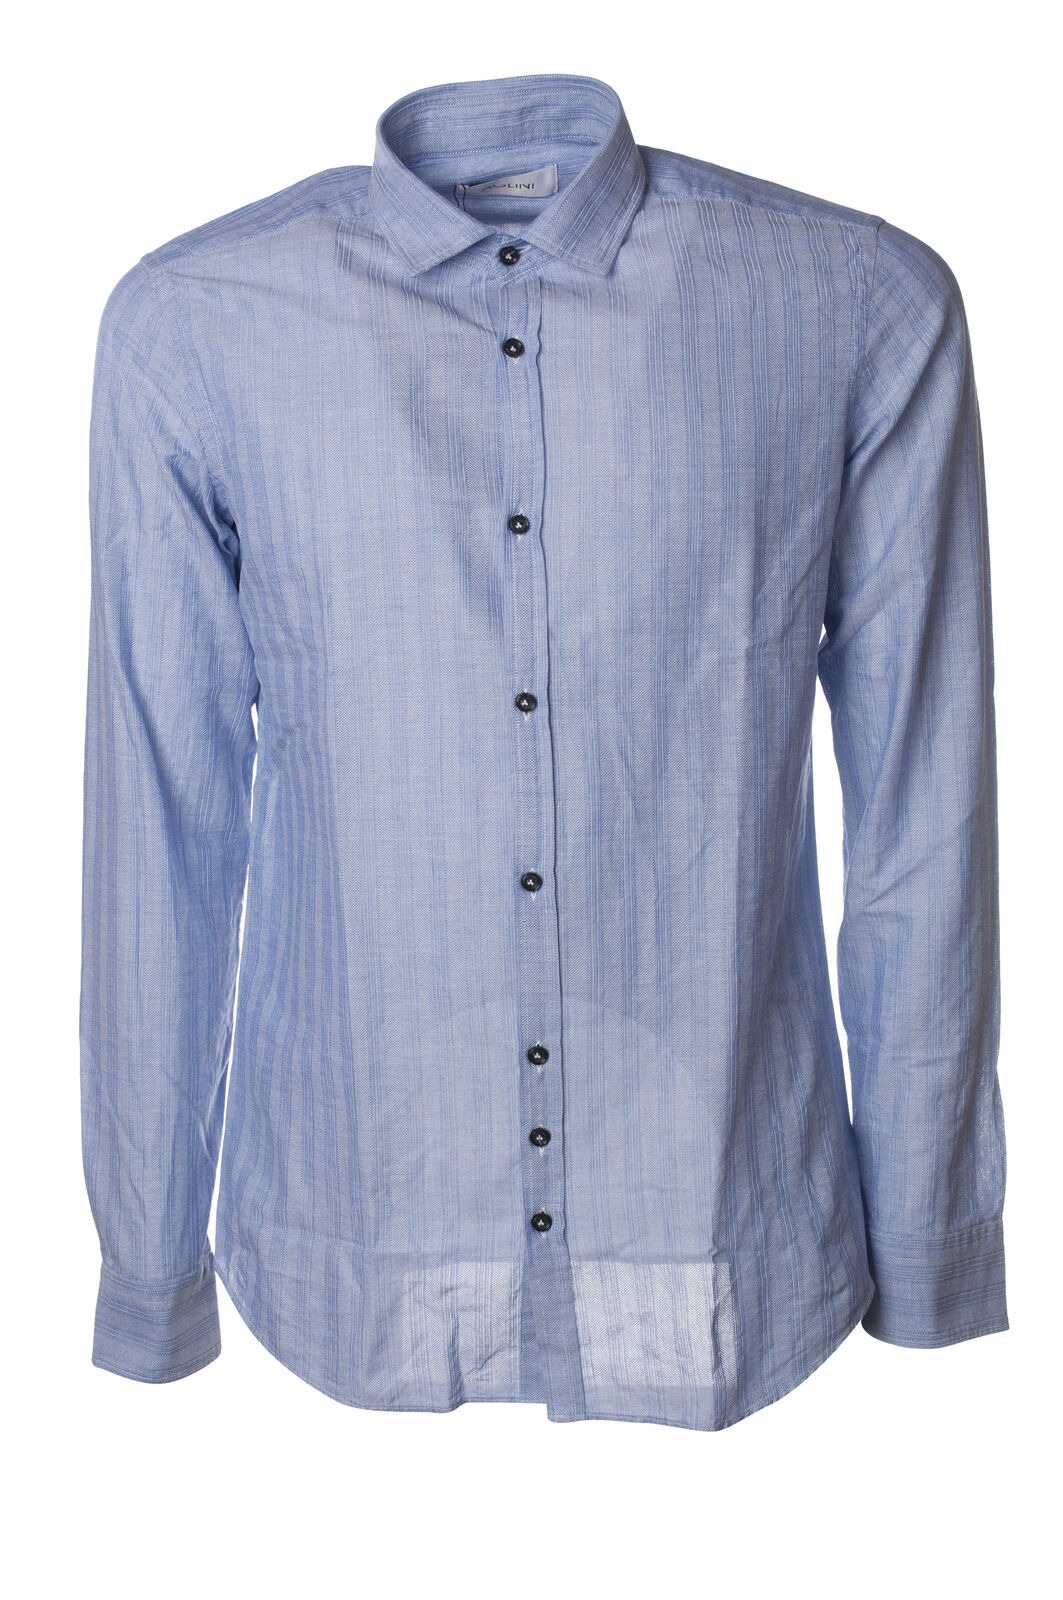 Aglini - bluesen-Shirt - Mann - blue - 6086621C191340